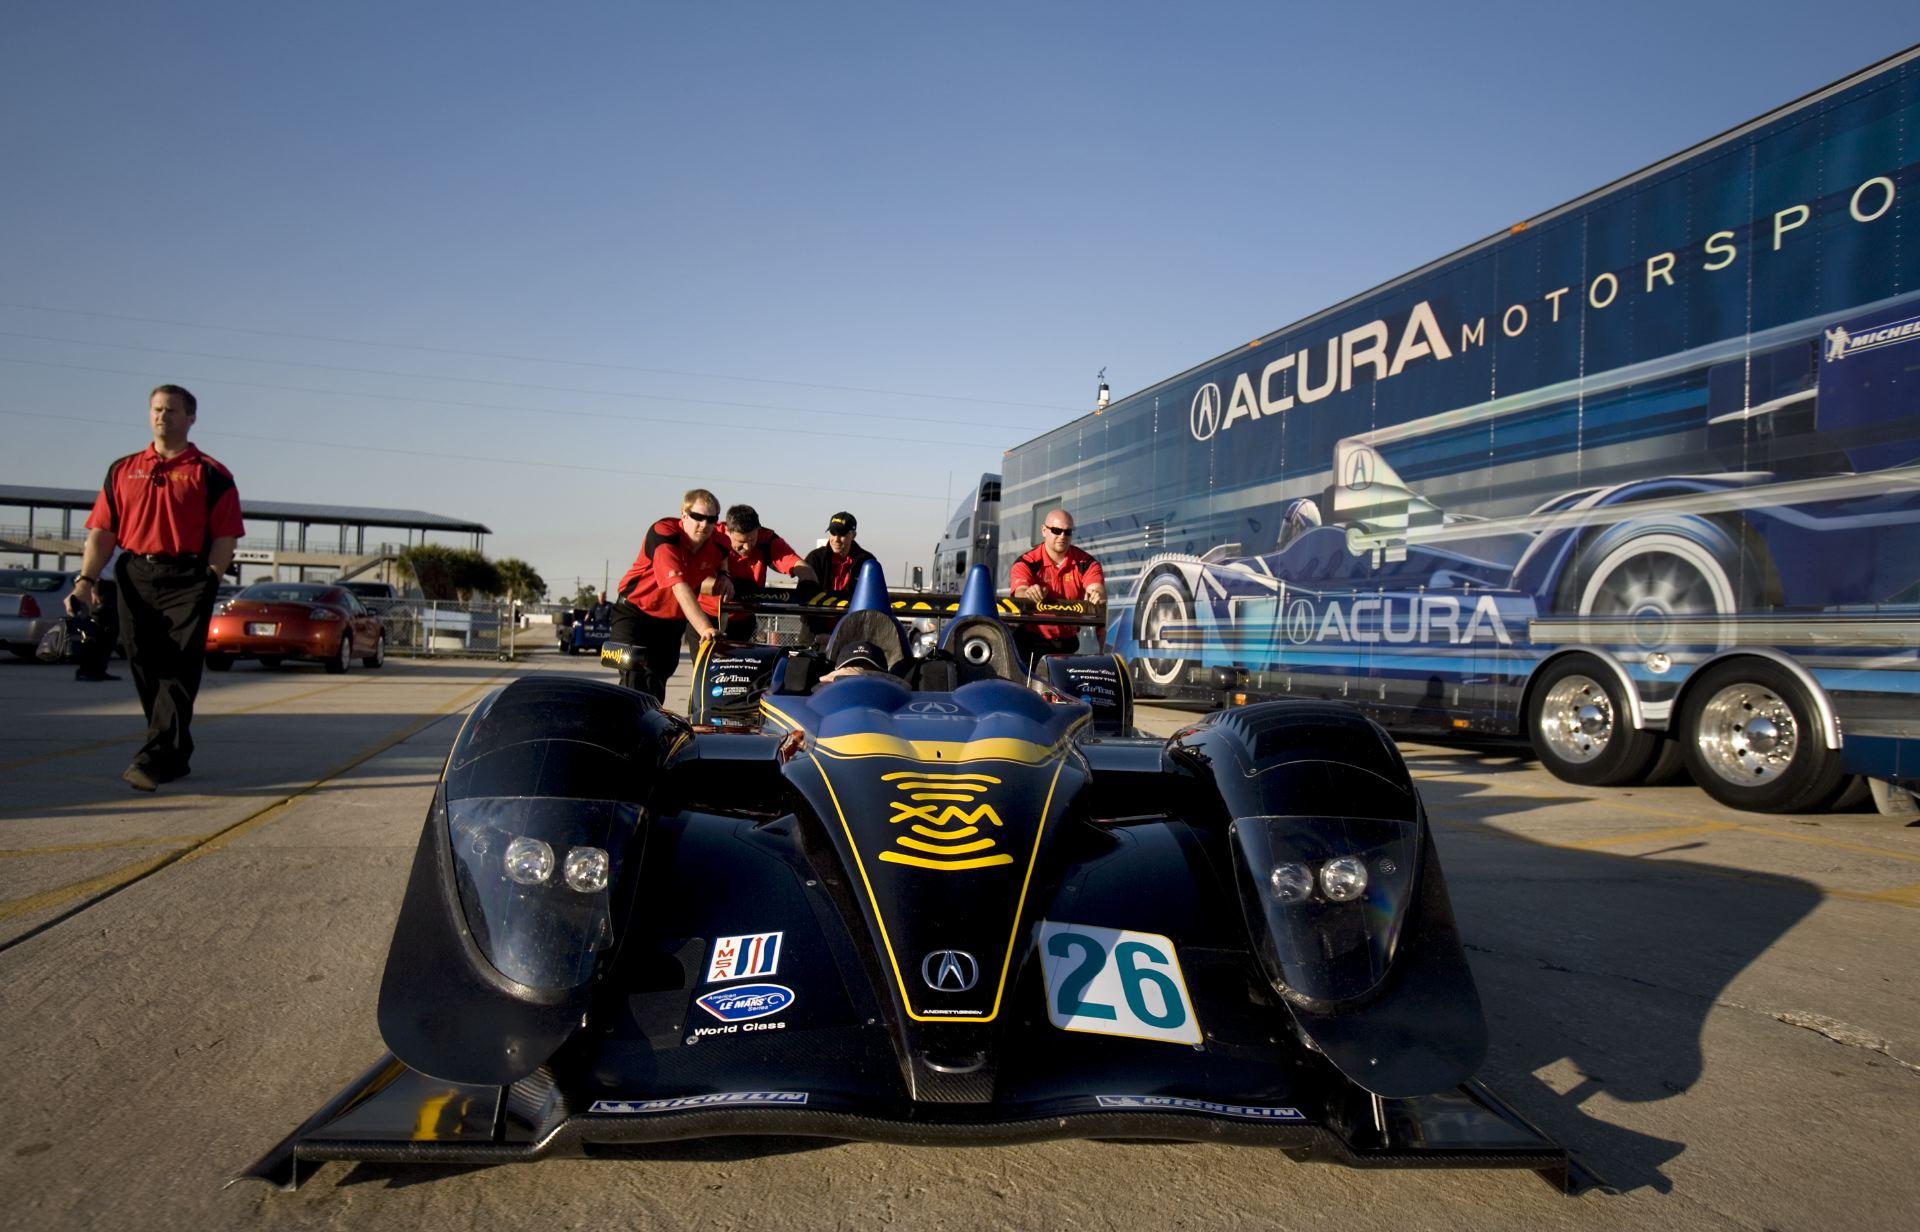 Acura_Motorsports_02.JPG